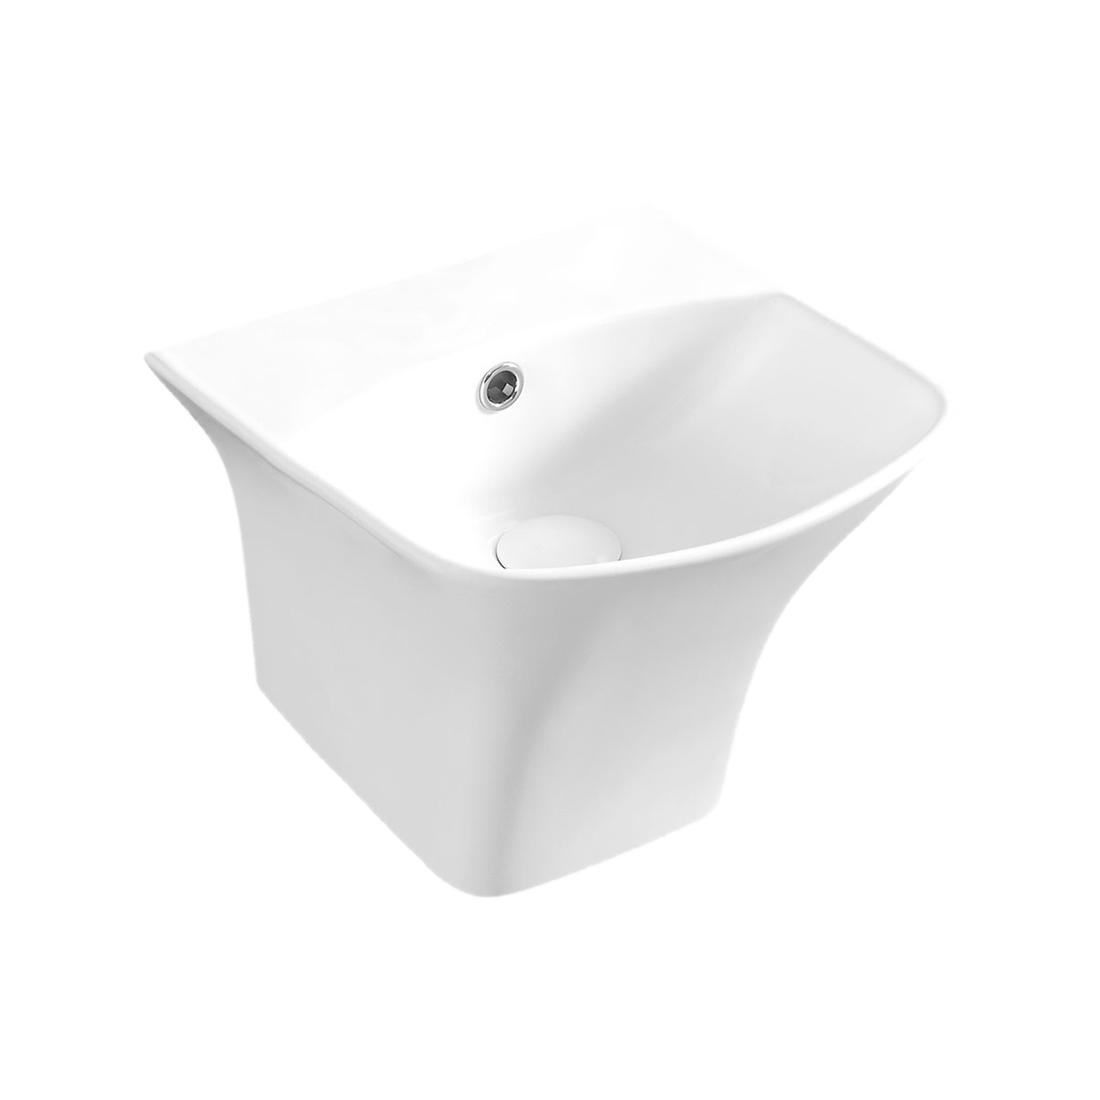 Kerovit Blanca S KB5200D Wash Basin With Integrated Half Pedestal